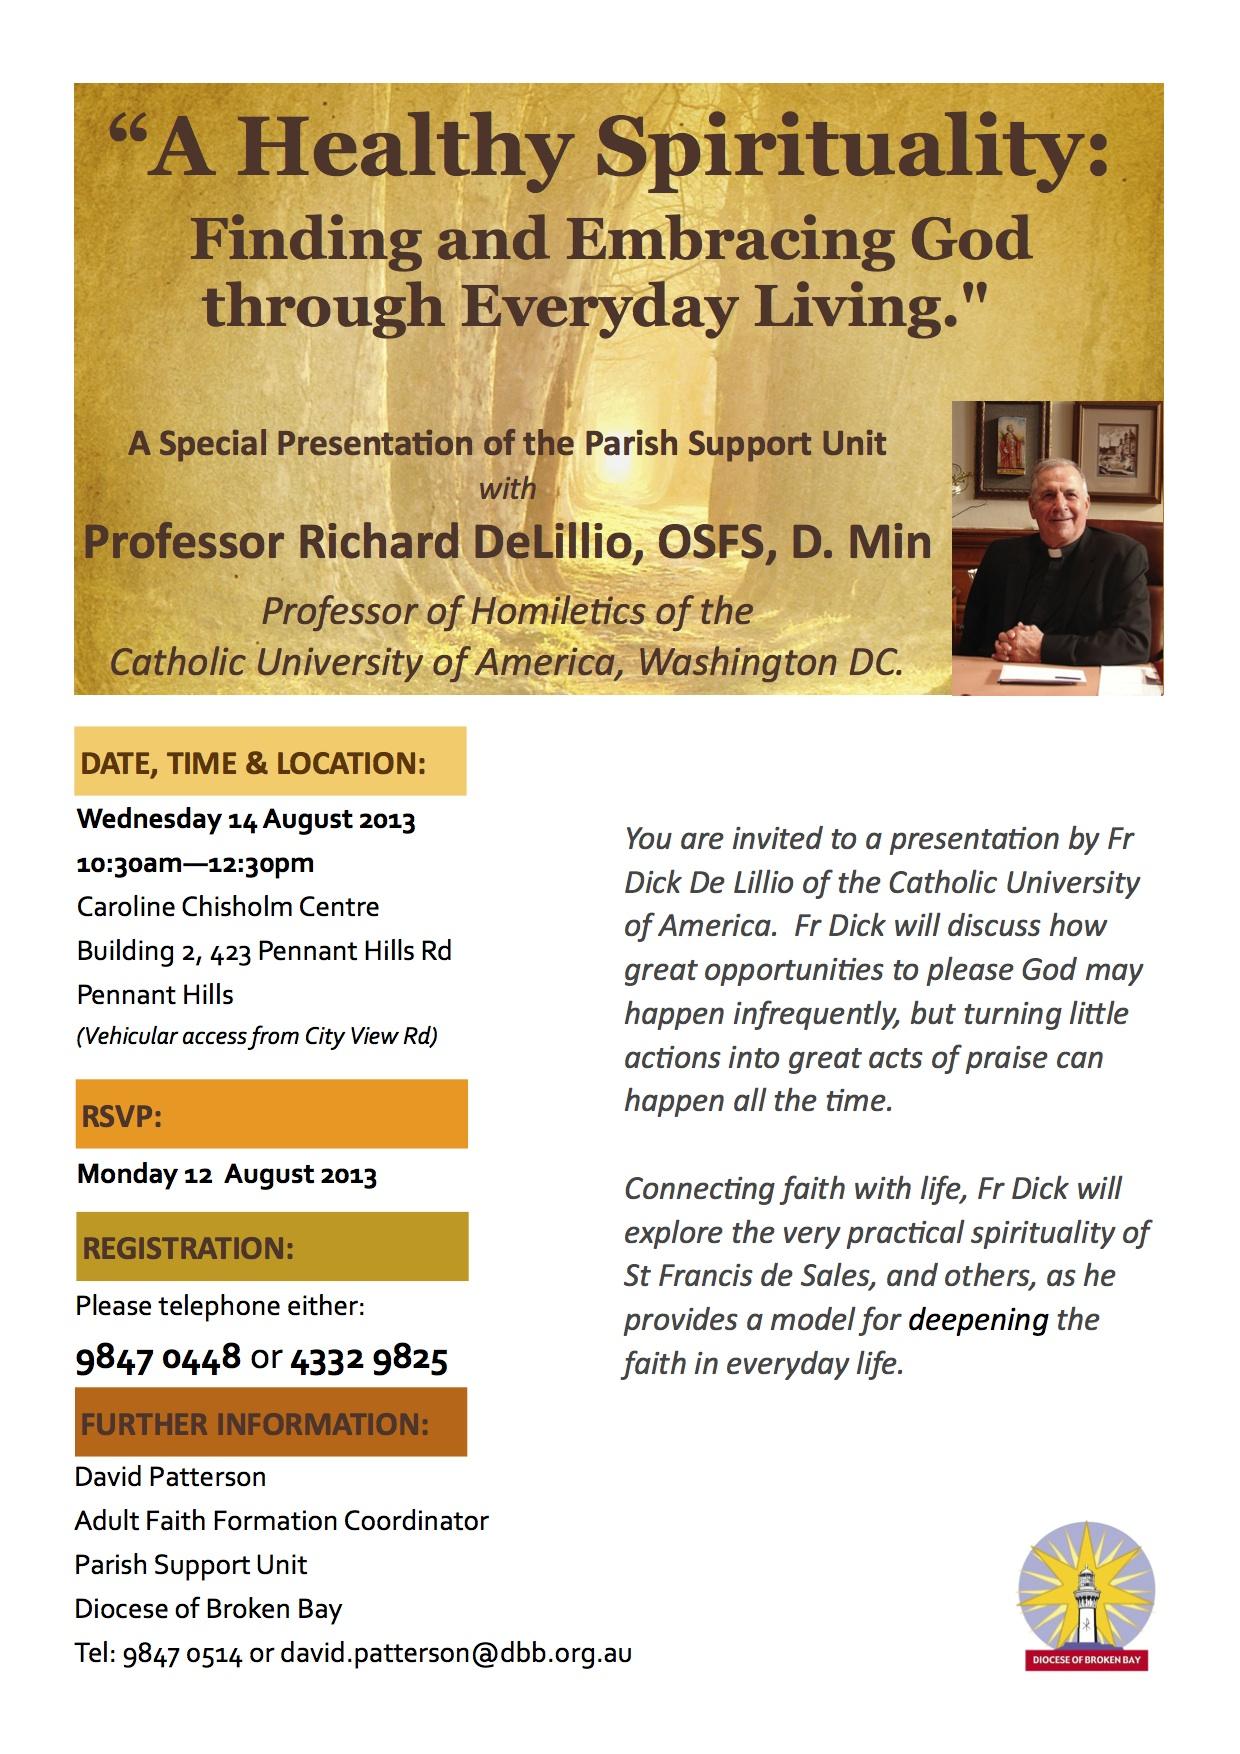 Professor Richard DeLillio 21 Aug 2013 FINAL sdr